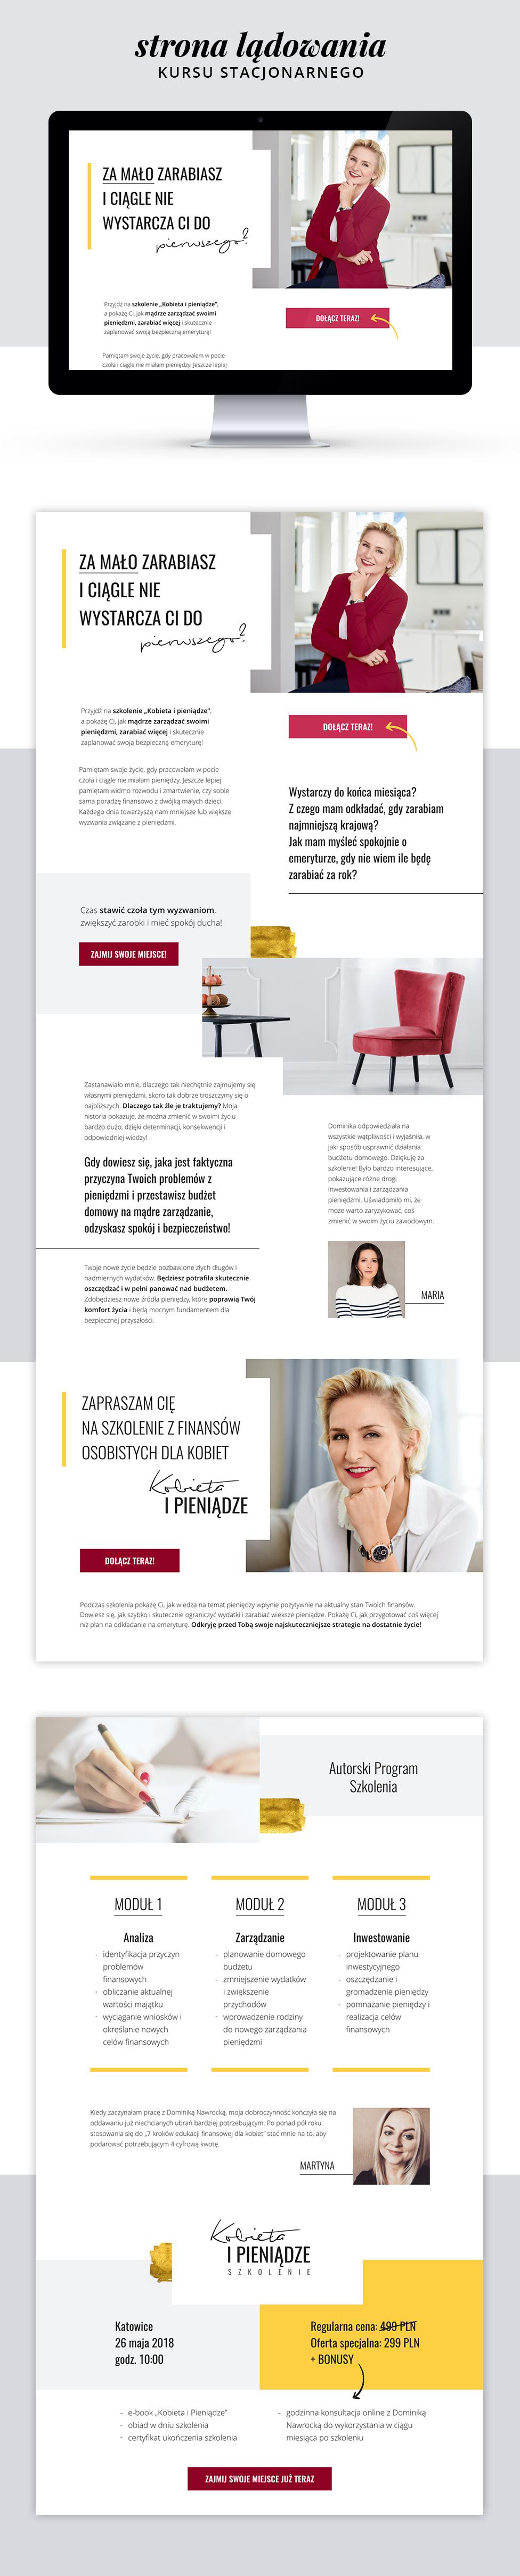 Kobieta i pieniądze - webdesign - galeria